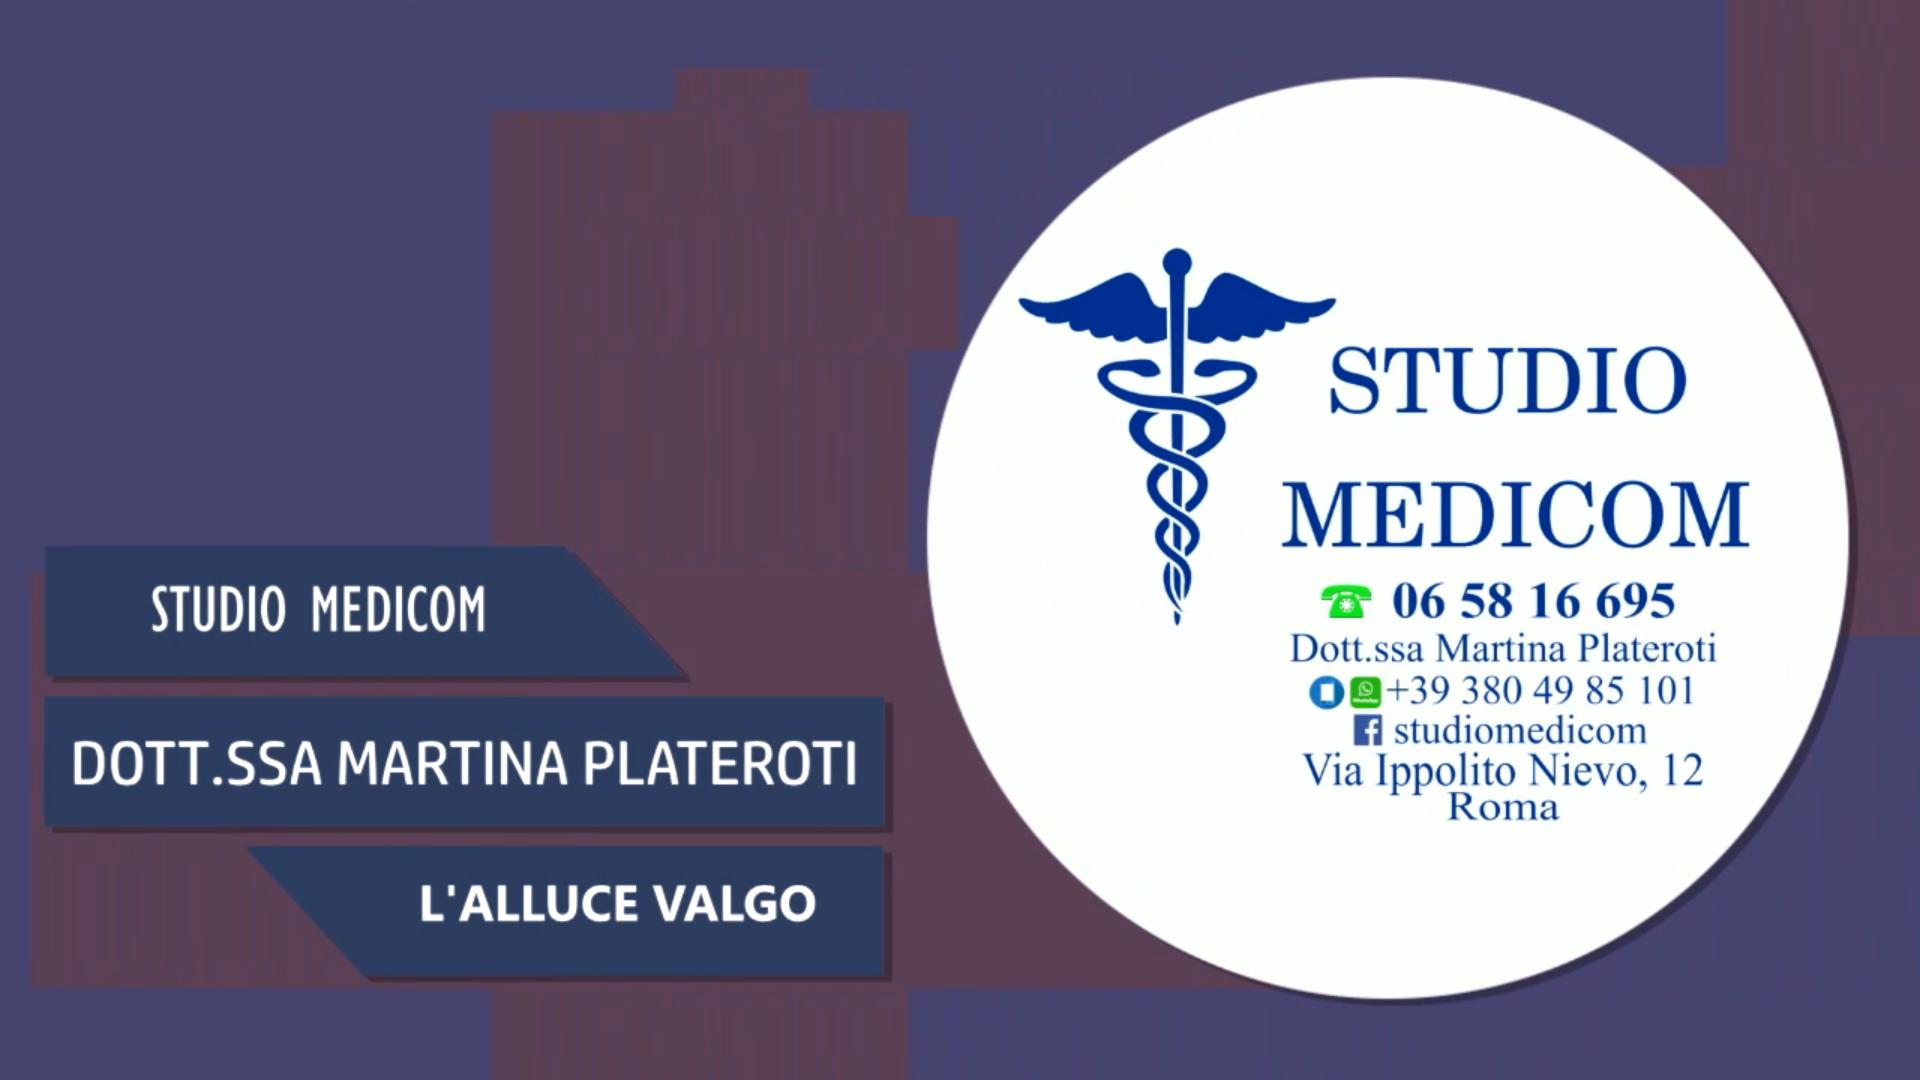 Intervista alla Dott.ssa Martina Plateroti – L'alluce valgo